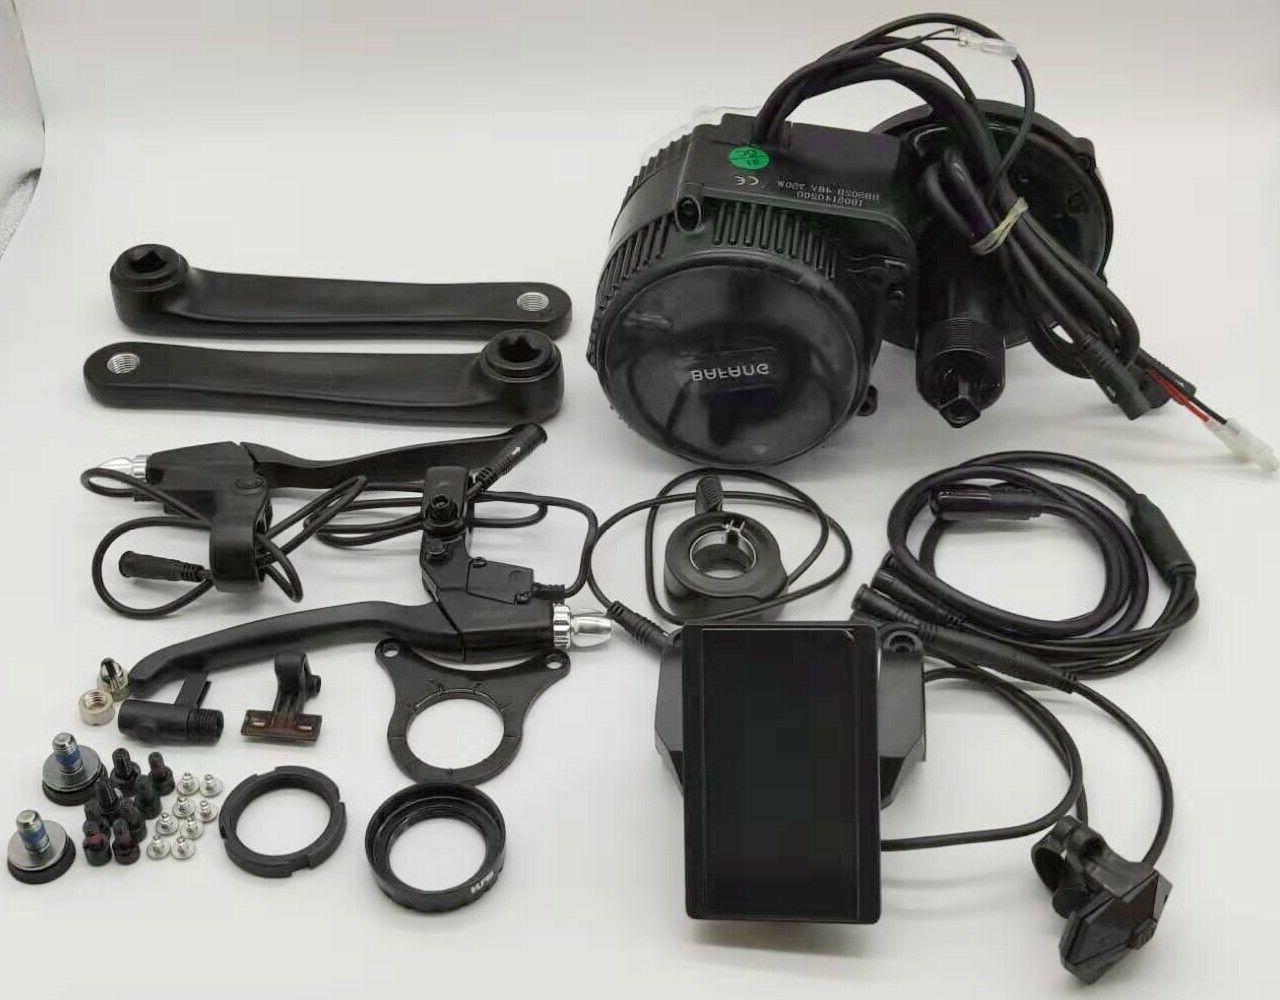 8fun 250W Mid Drive Motor Electric Bicycle Conversion Kit